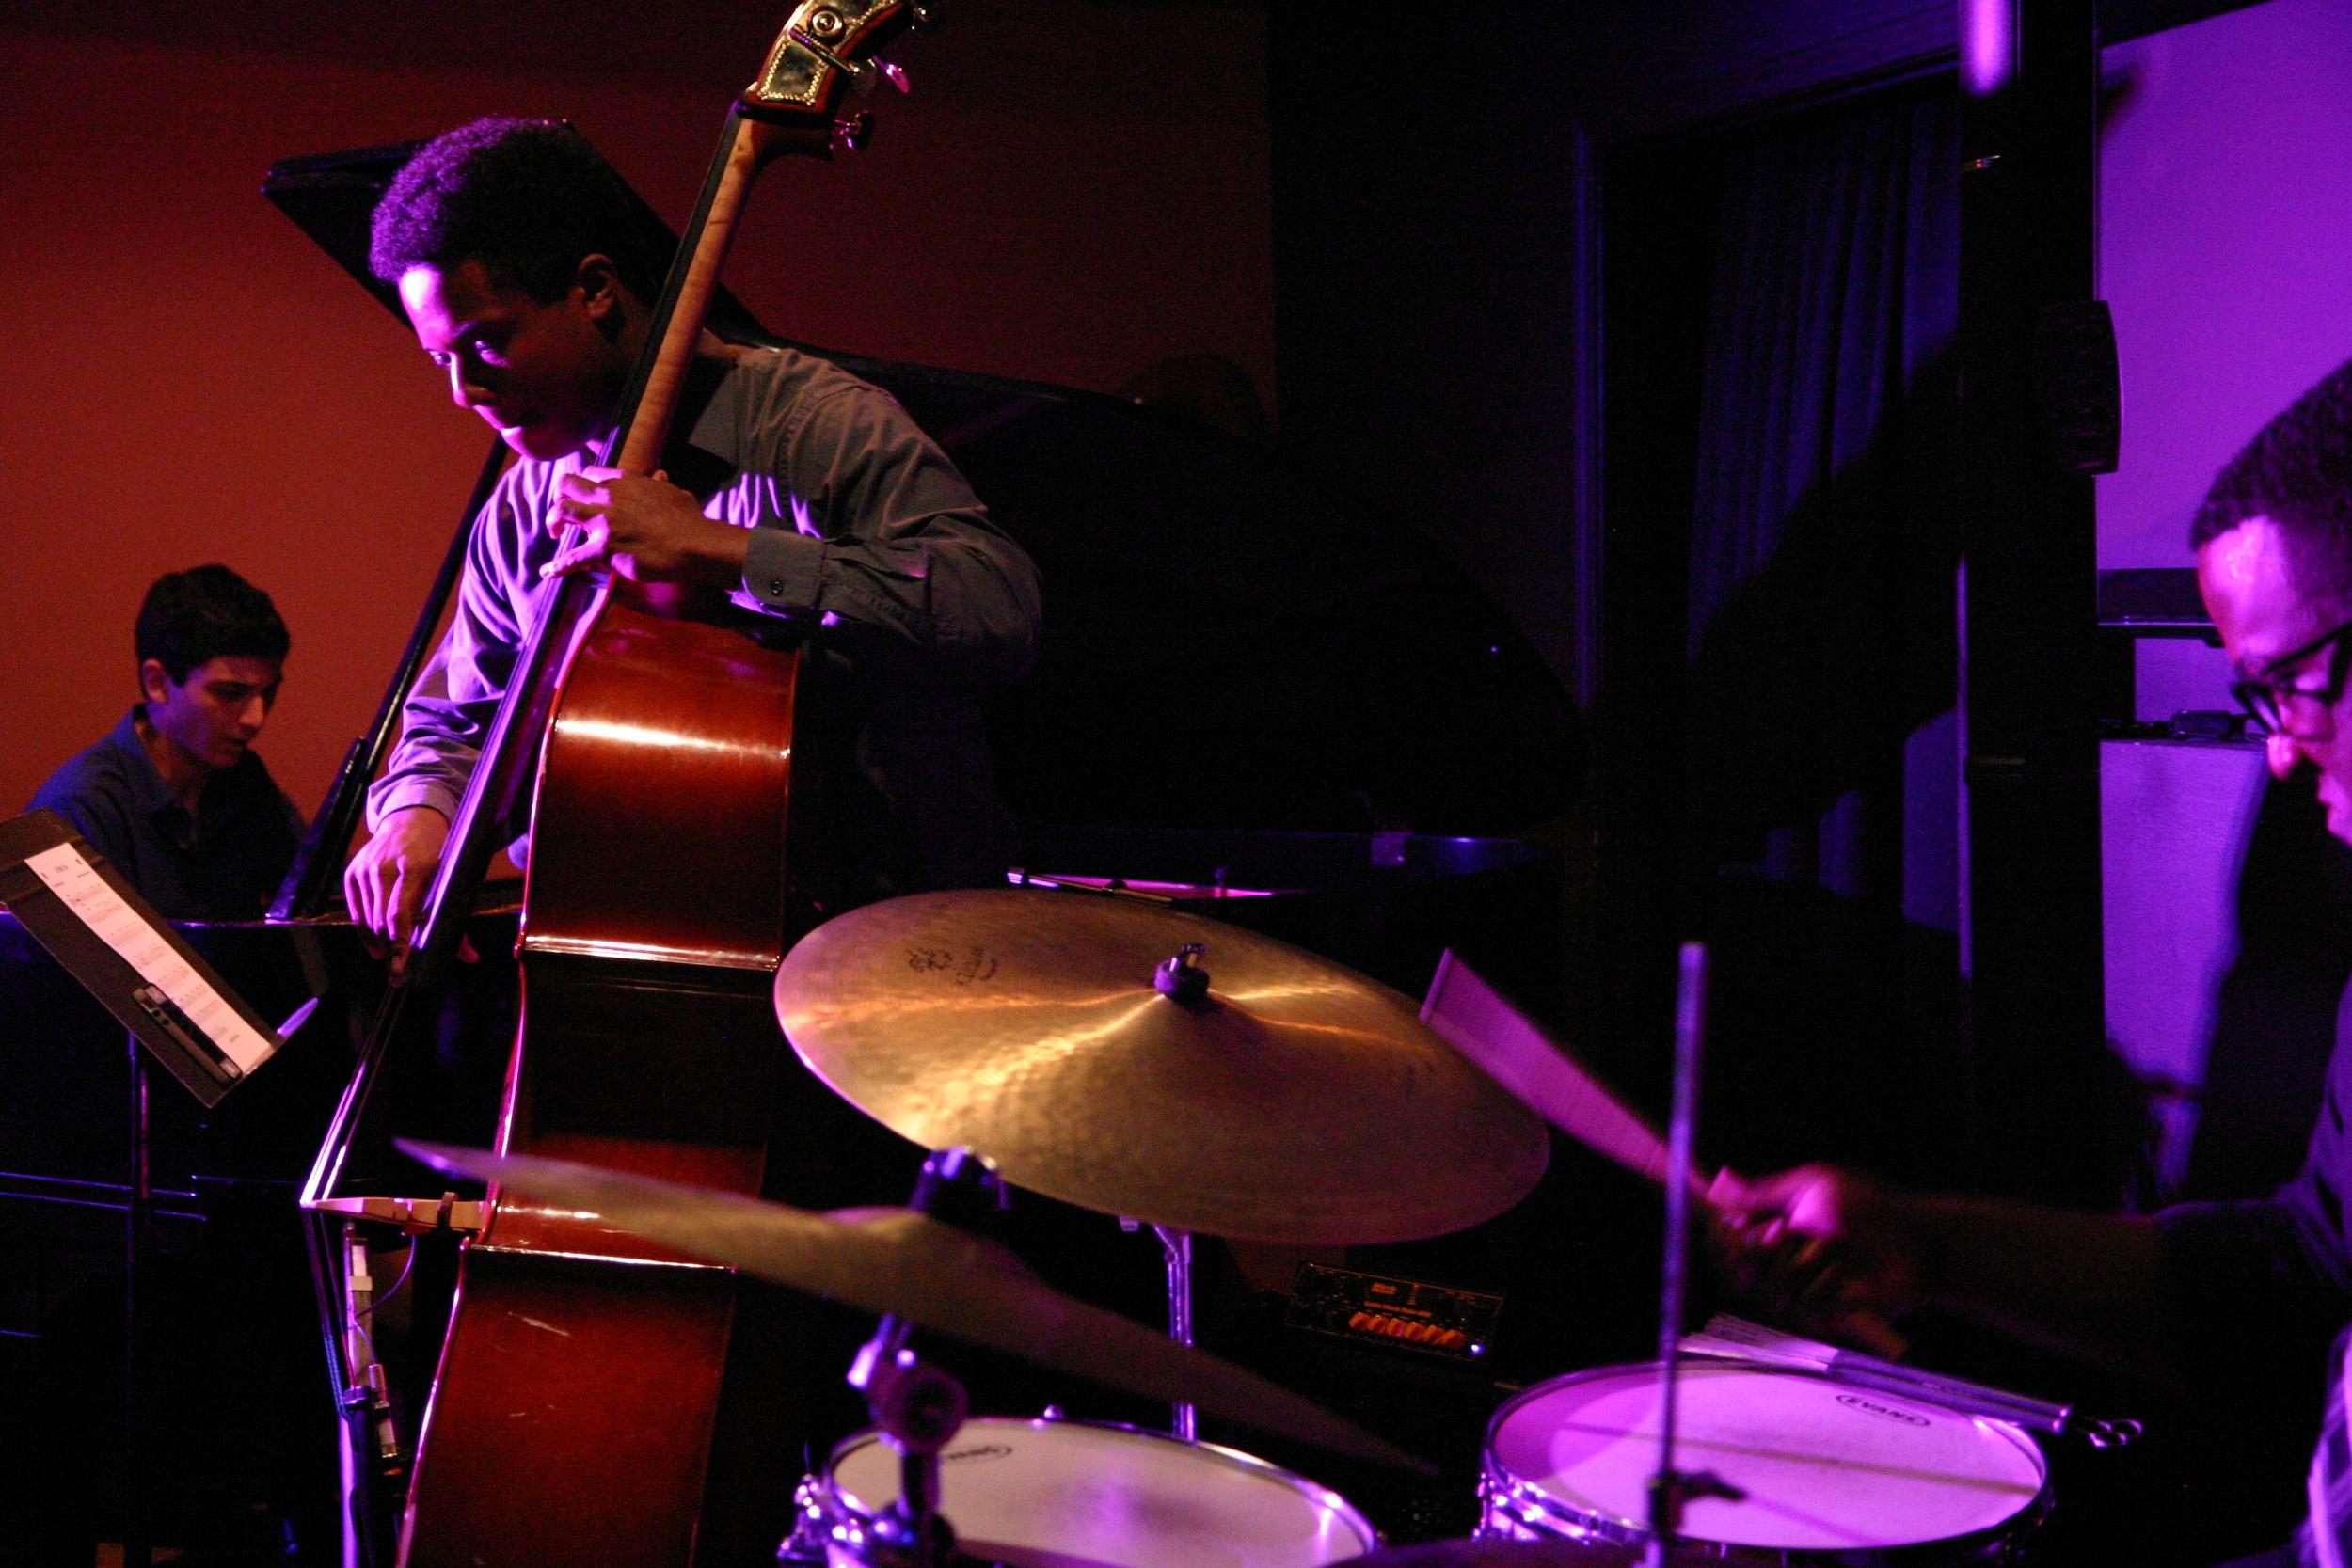 w/ Andres Rovira and Robert Boone @ The Velvet Note